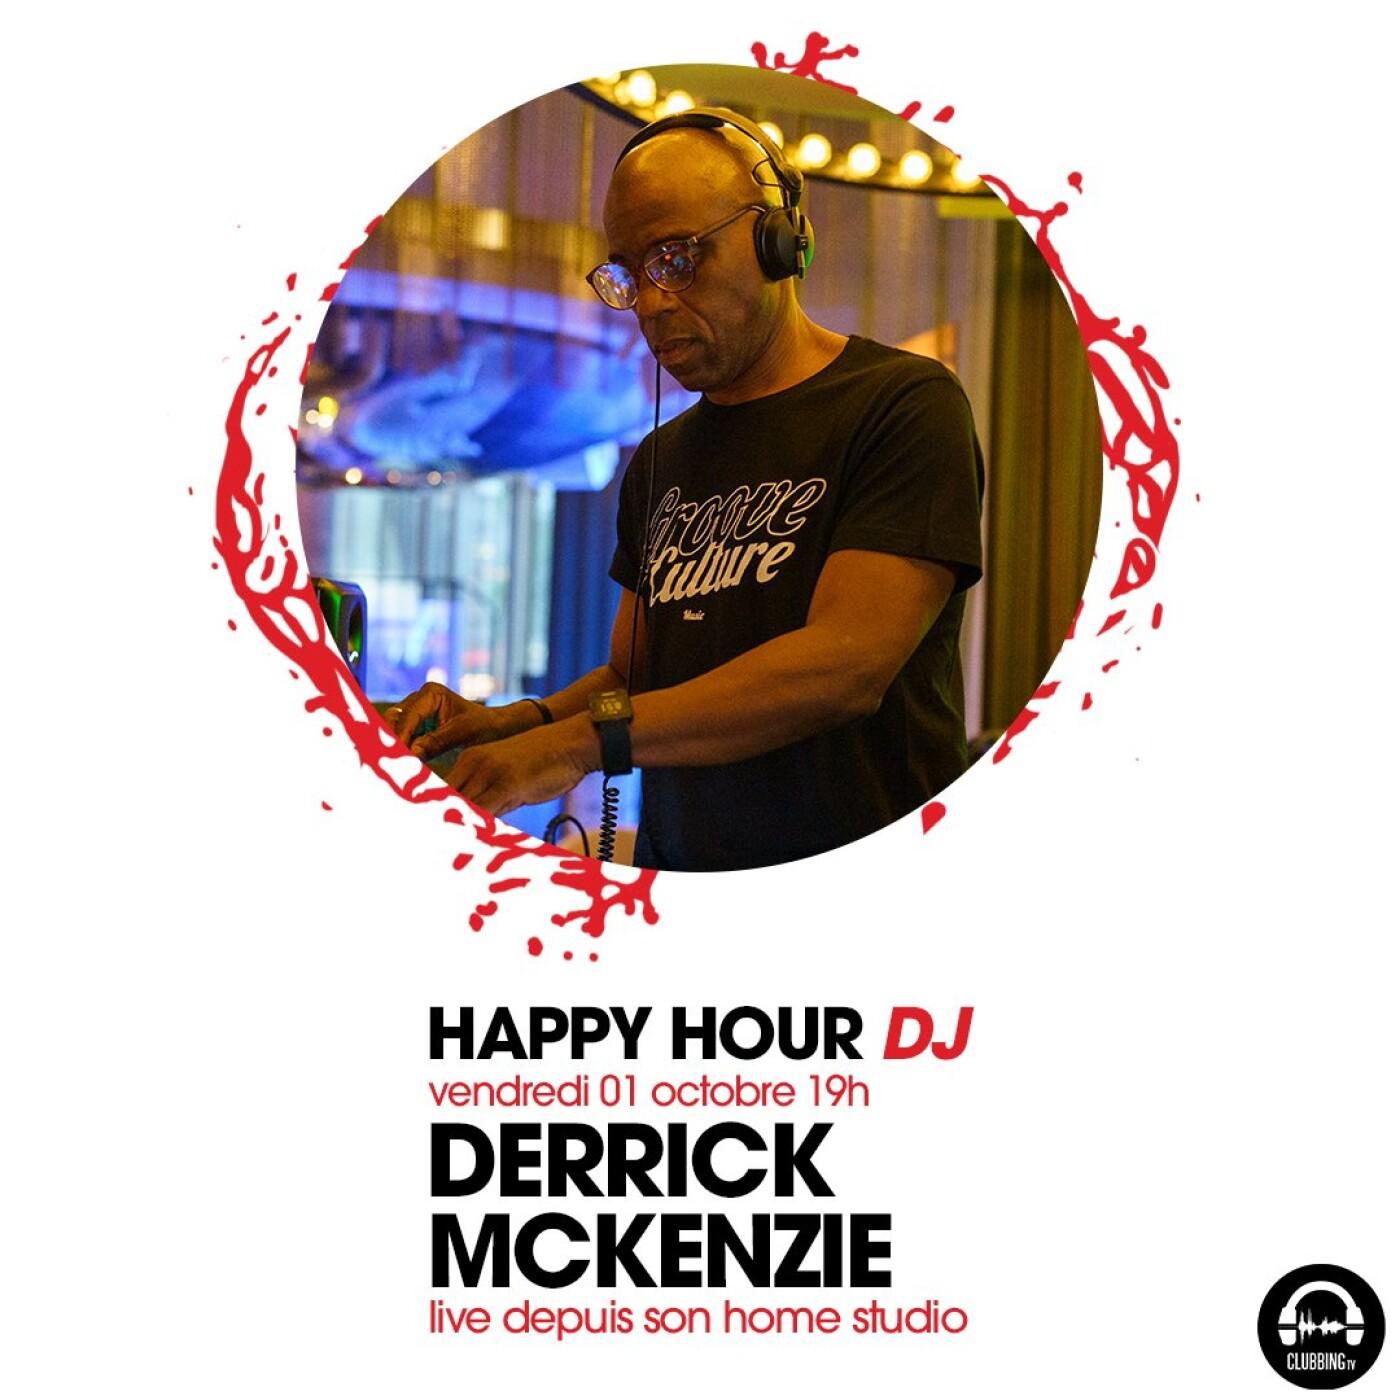 HAPPY HOUR DJ : DERRICK MCKENZIE